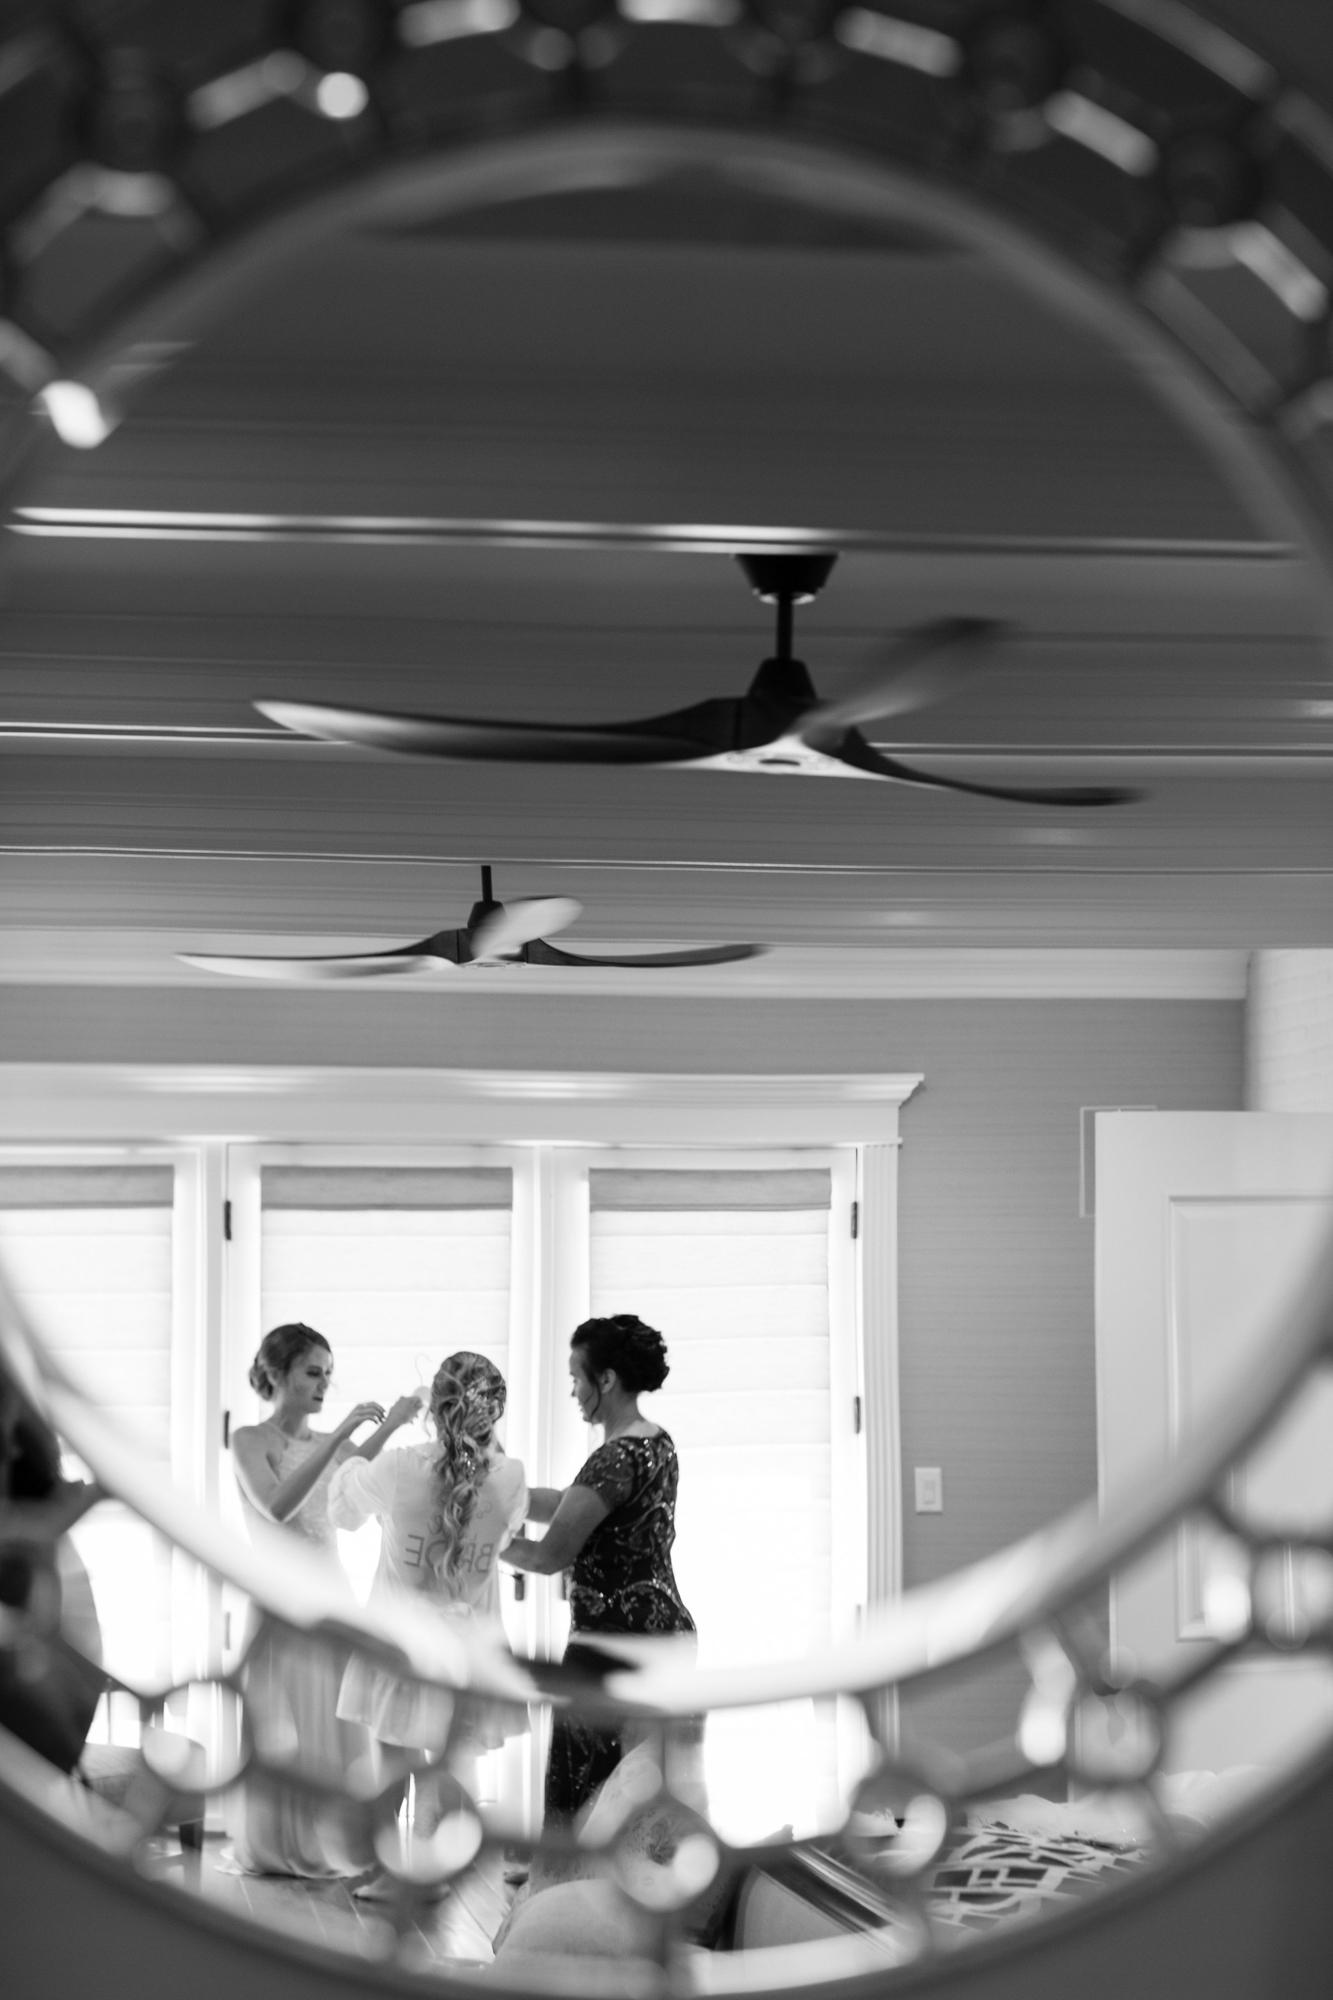 greek-wedding-salt-lake-city-utah-3.jpg